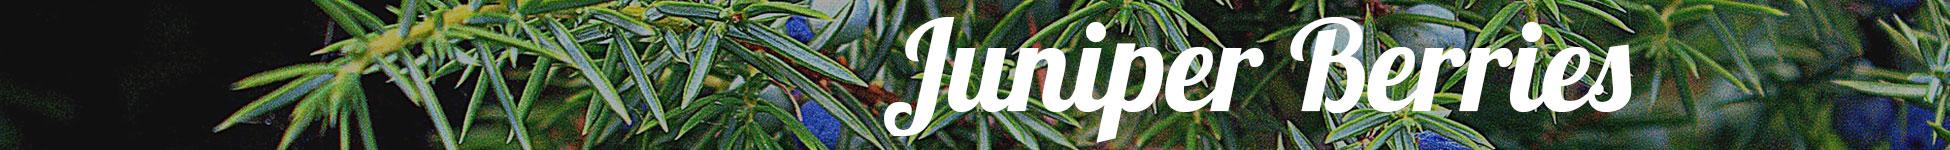 Gin Botanicals Juniper Berries